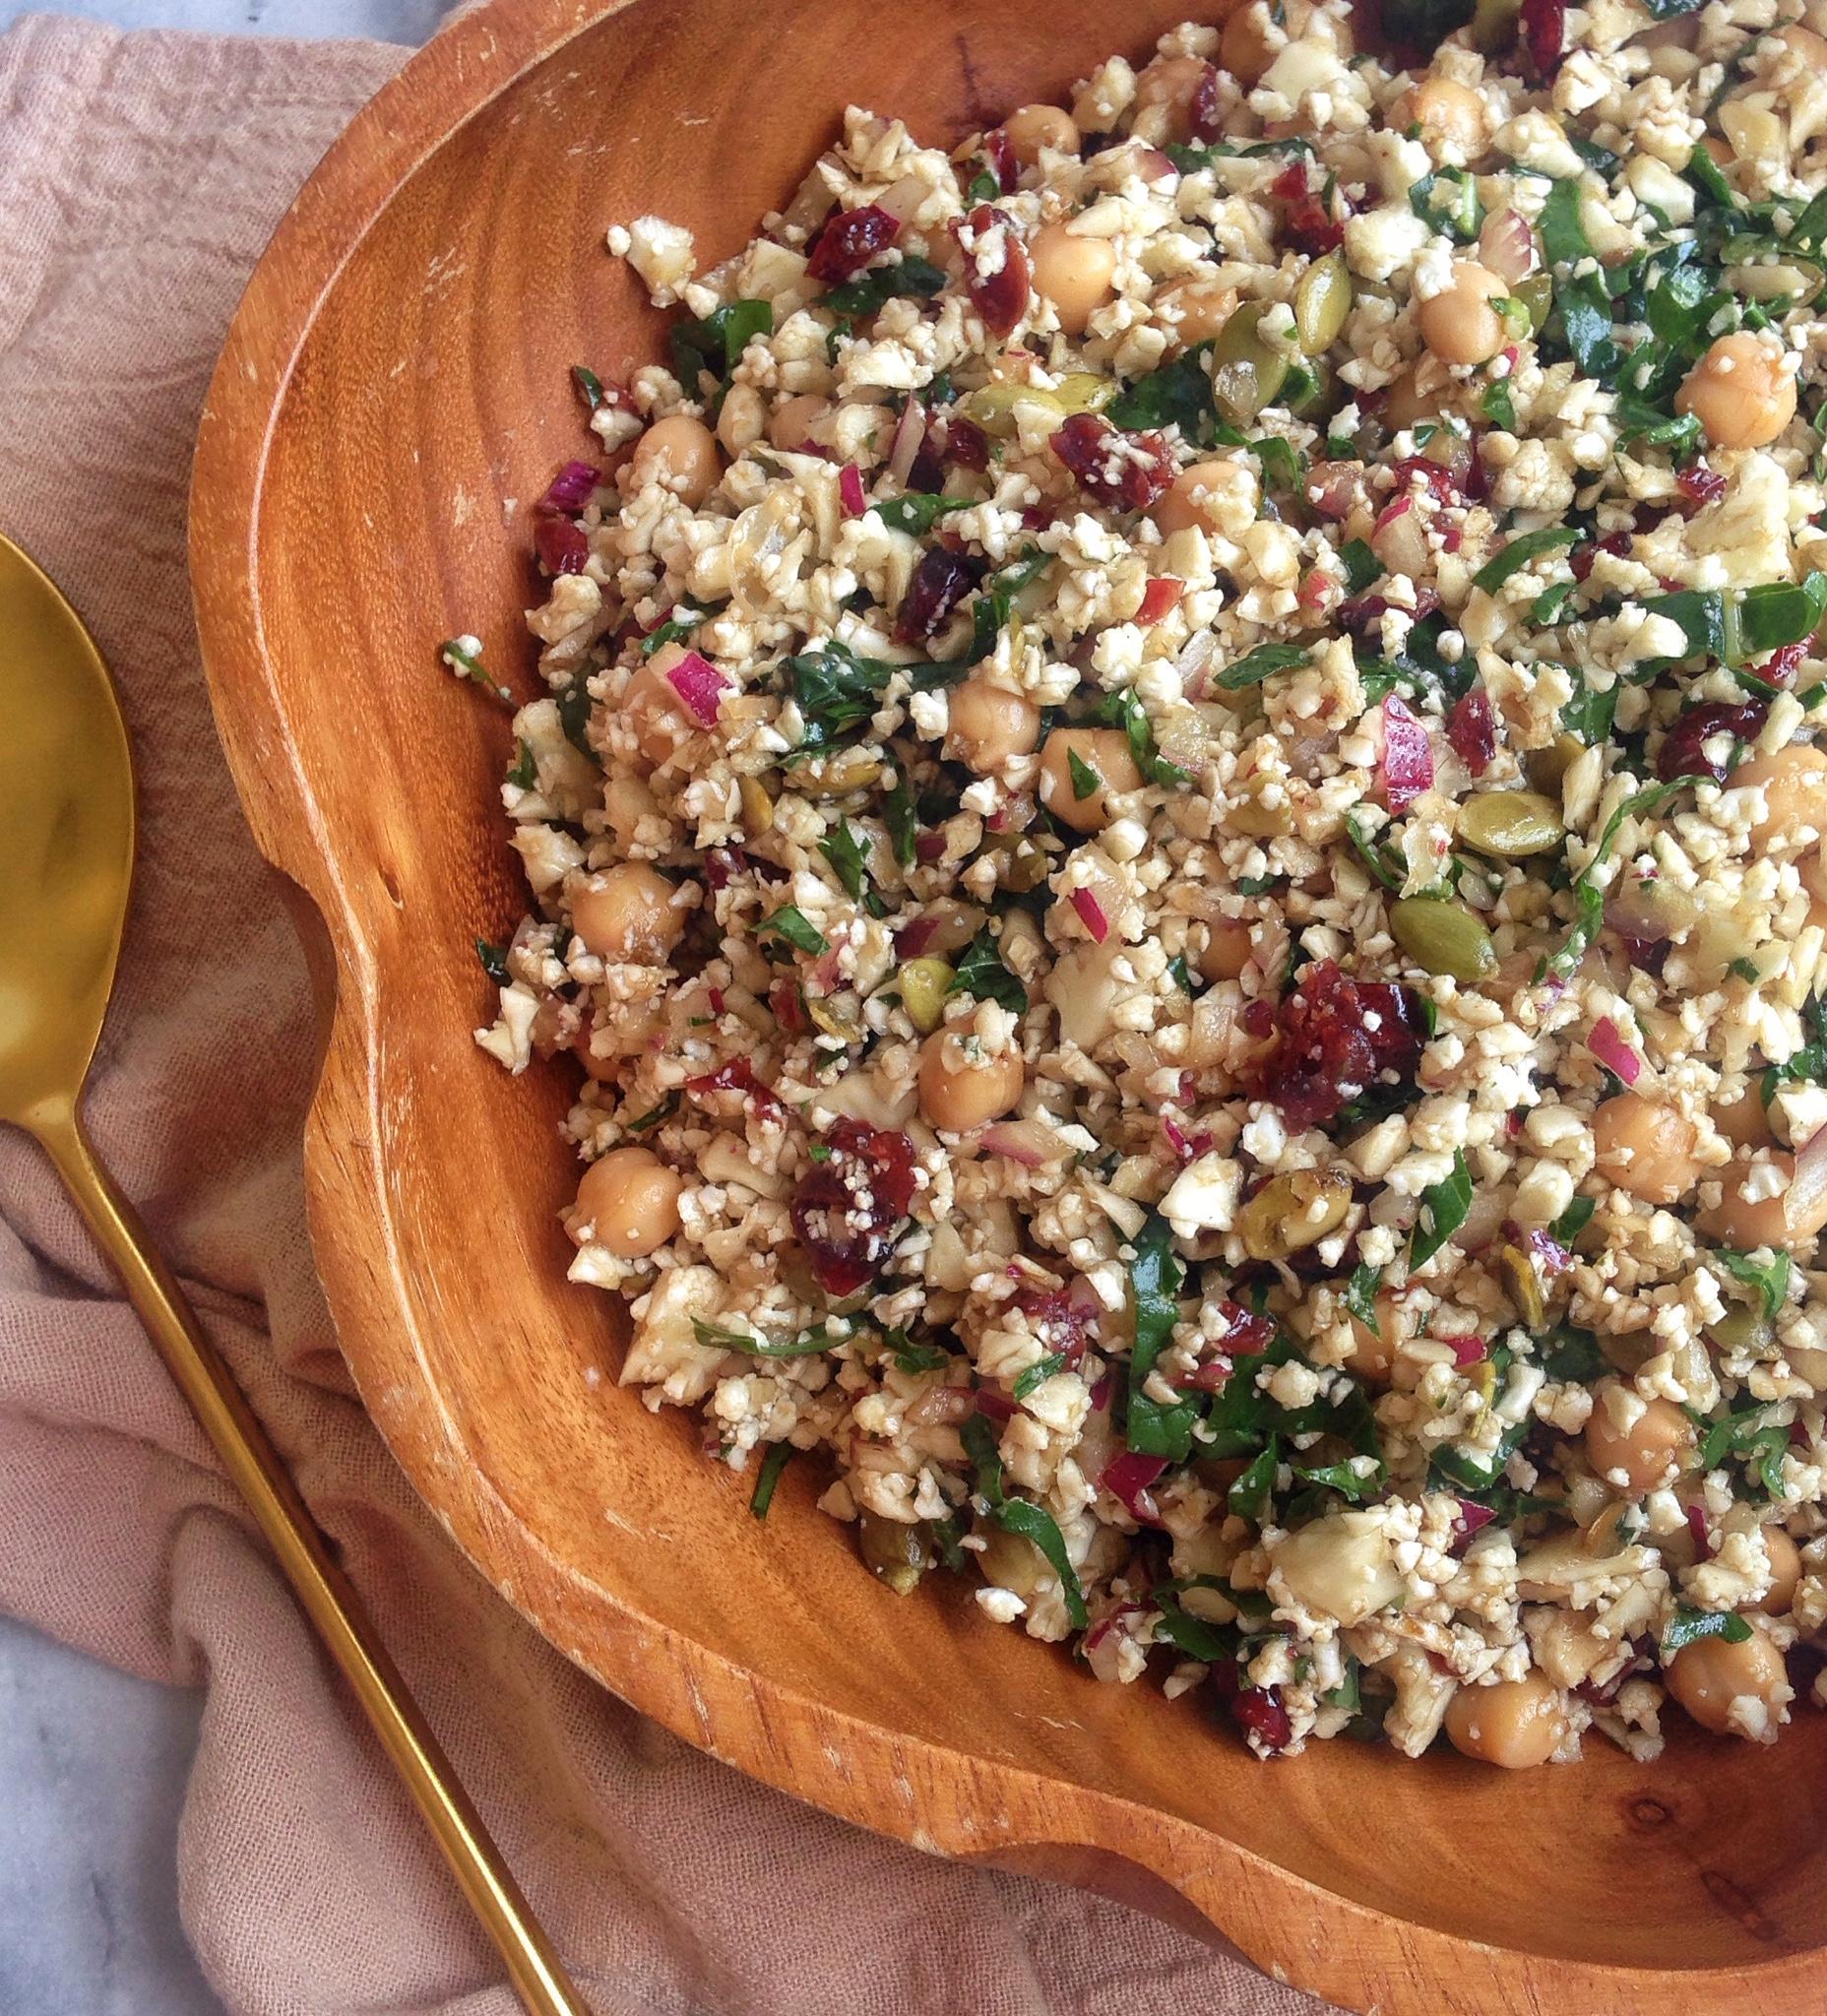 Cauliflower Cranberry Superfood Salad